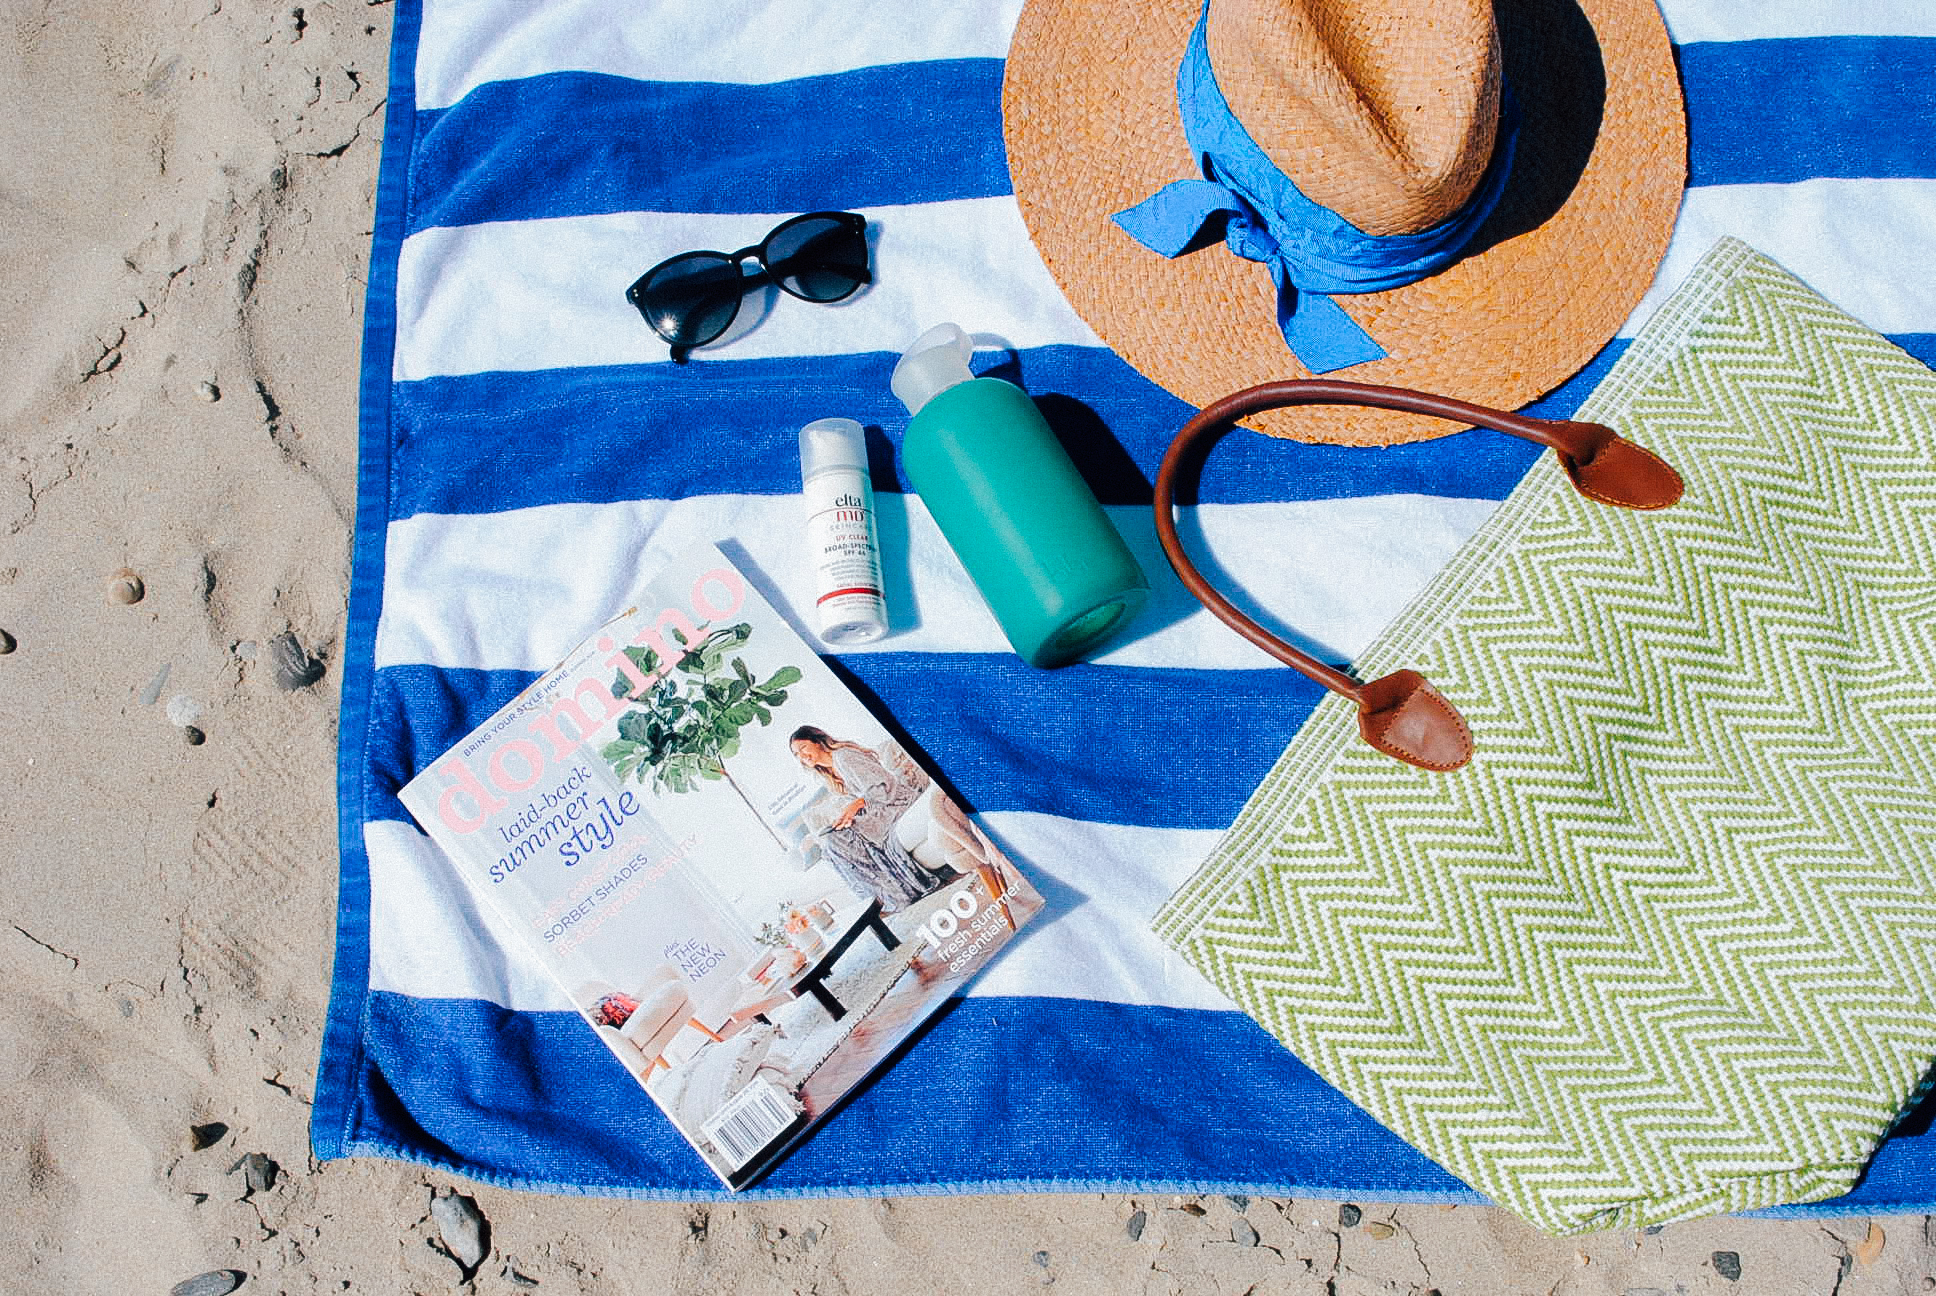 Dash & Albert Beach Bag (gifted)  Striped Beach Towel.   Sunglasses.    BKR Water Bottle.     Sunscreen.     Domino Magazine.    Lola Hat.